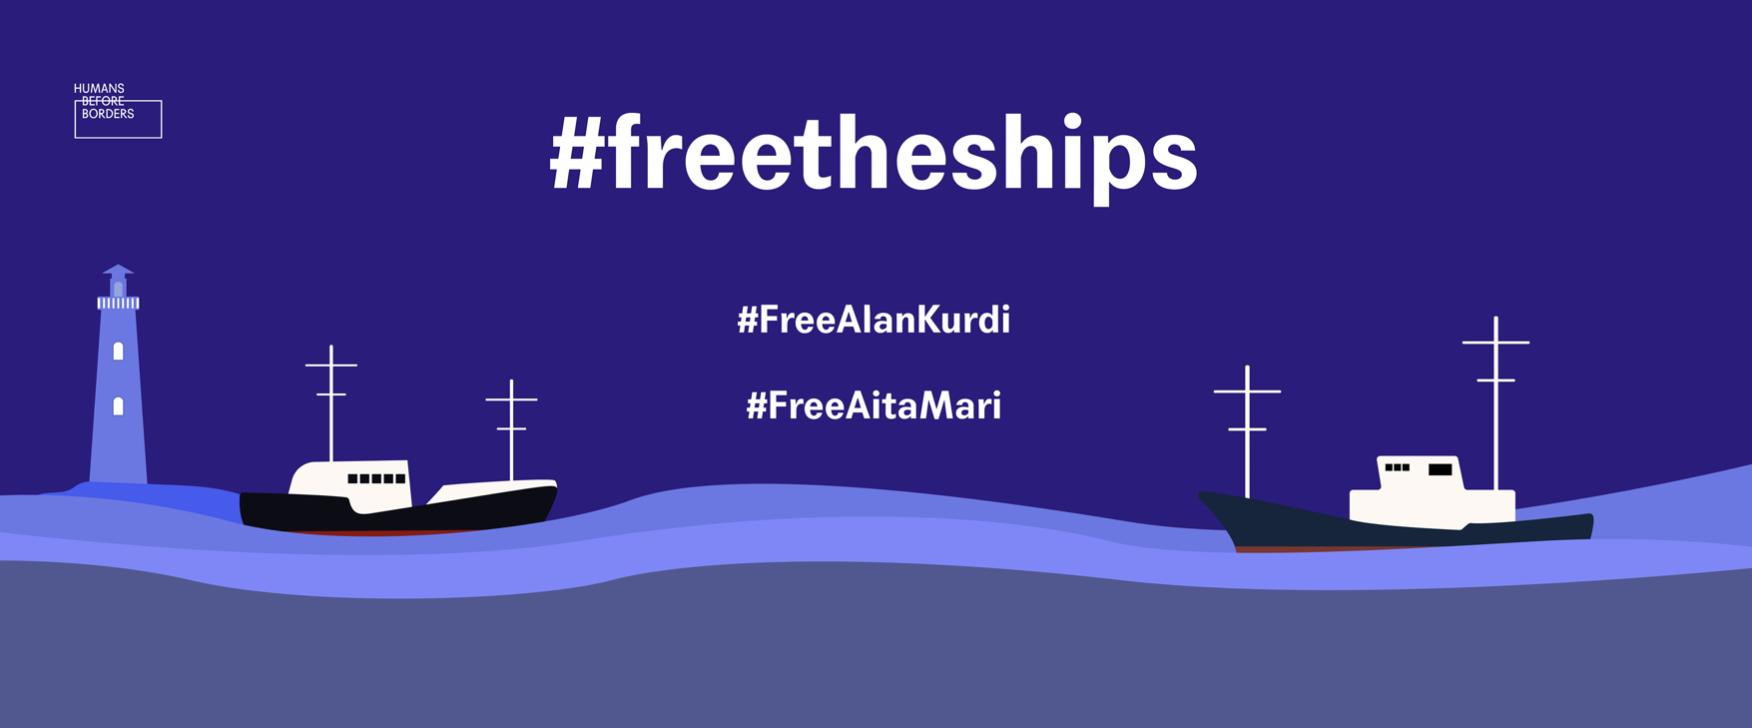 Humans Before Borders organiza protesto para libertação de navios de resgate no mar Mediterrâneo